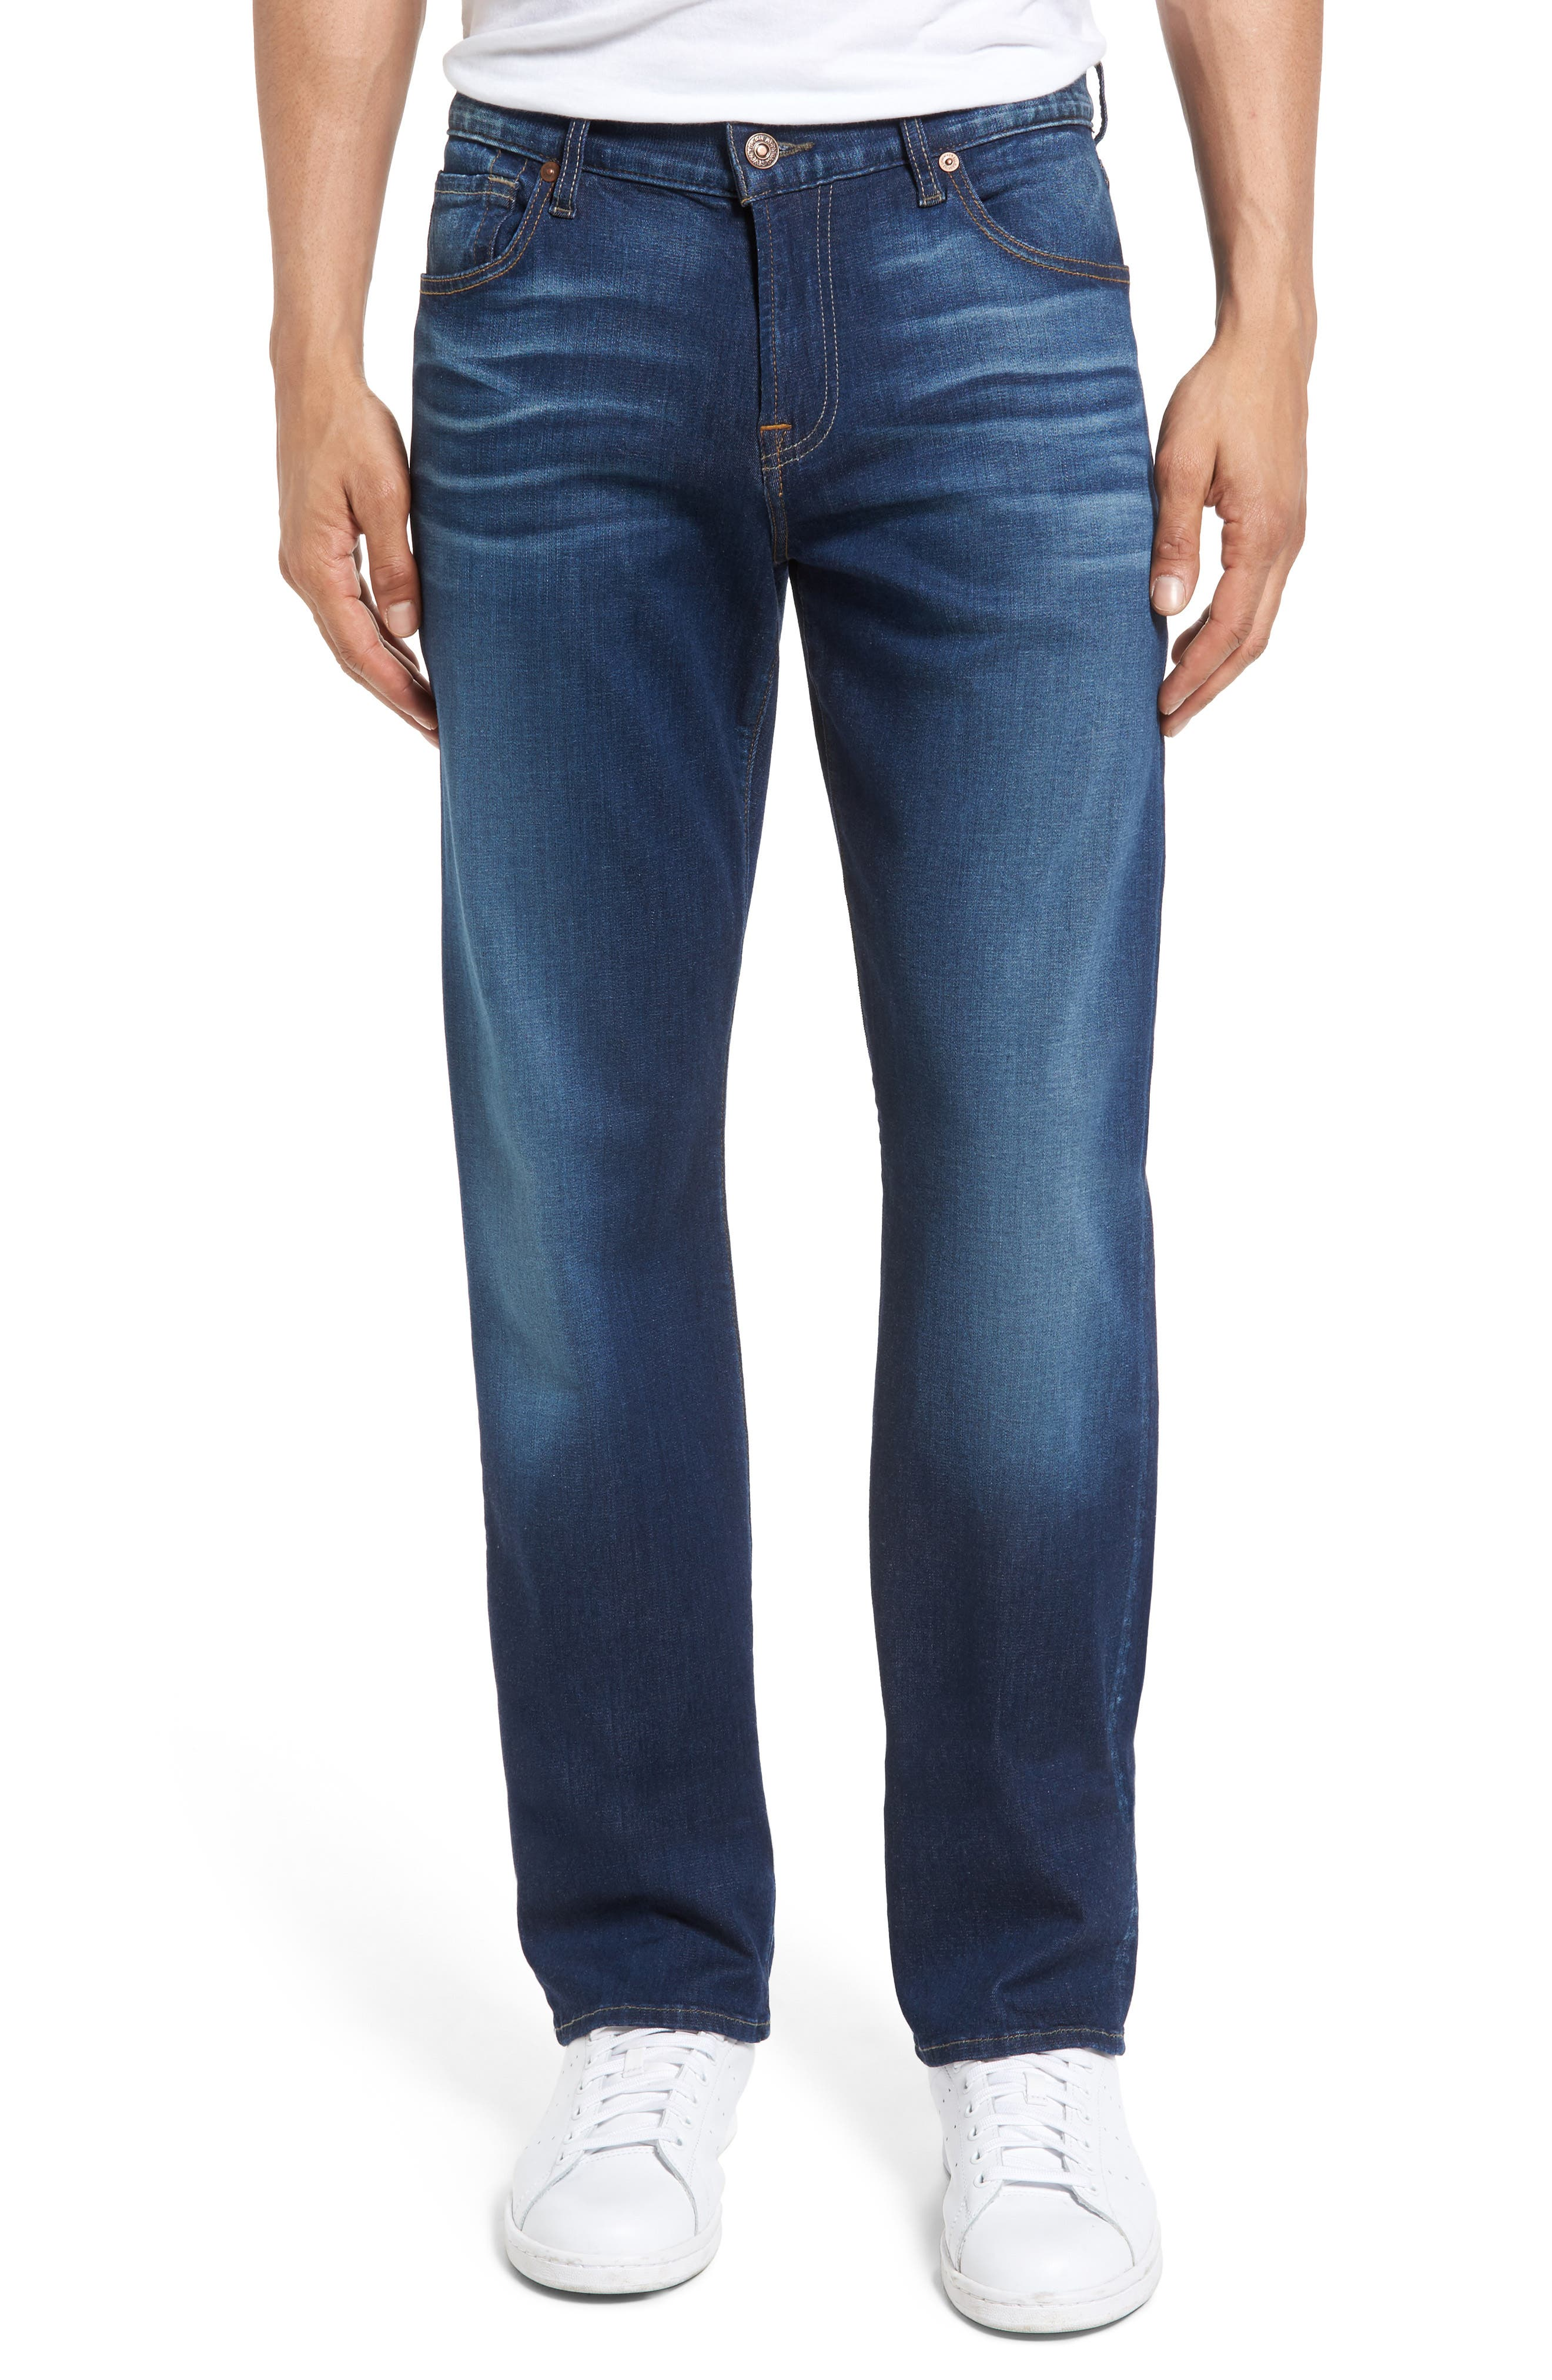 Alternate Image 1 Selected - 7 For All Mankind® Slimmy Slim Fit Jeans (MOMT-Momentum)